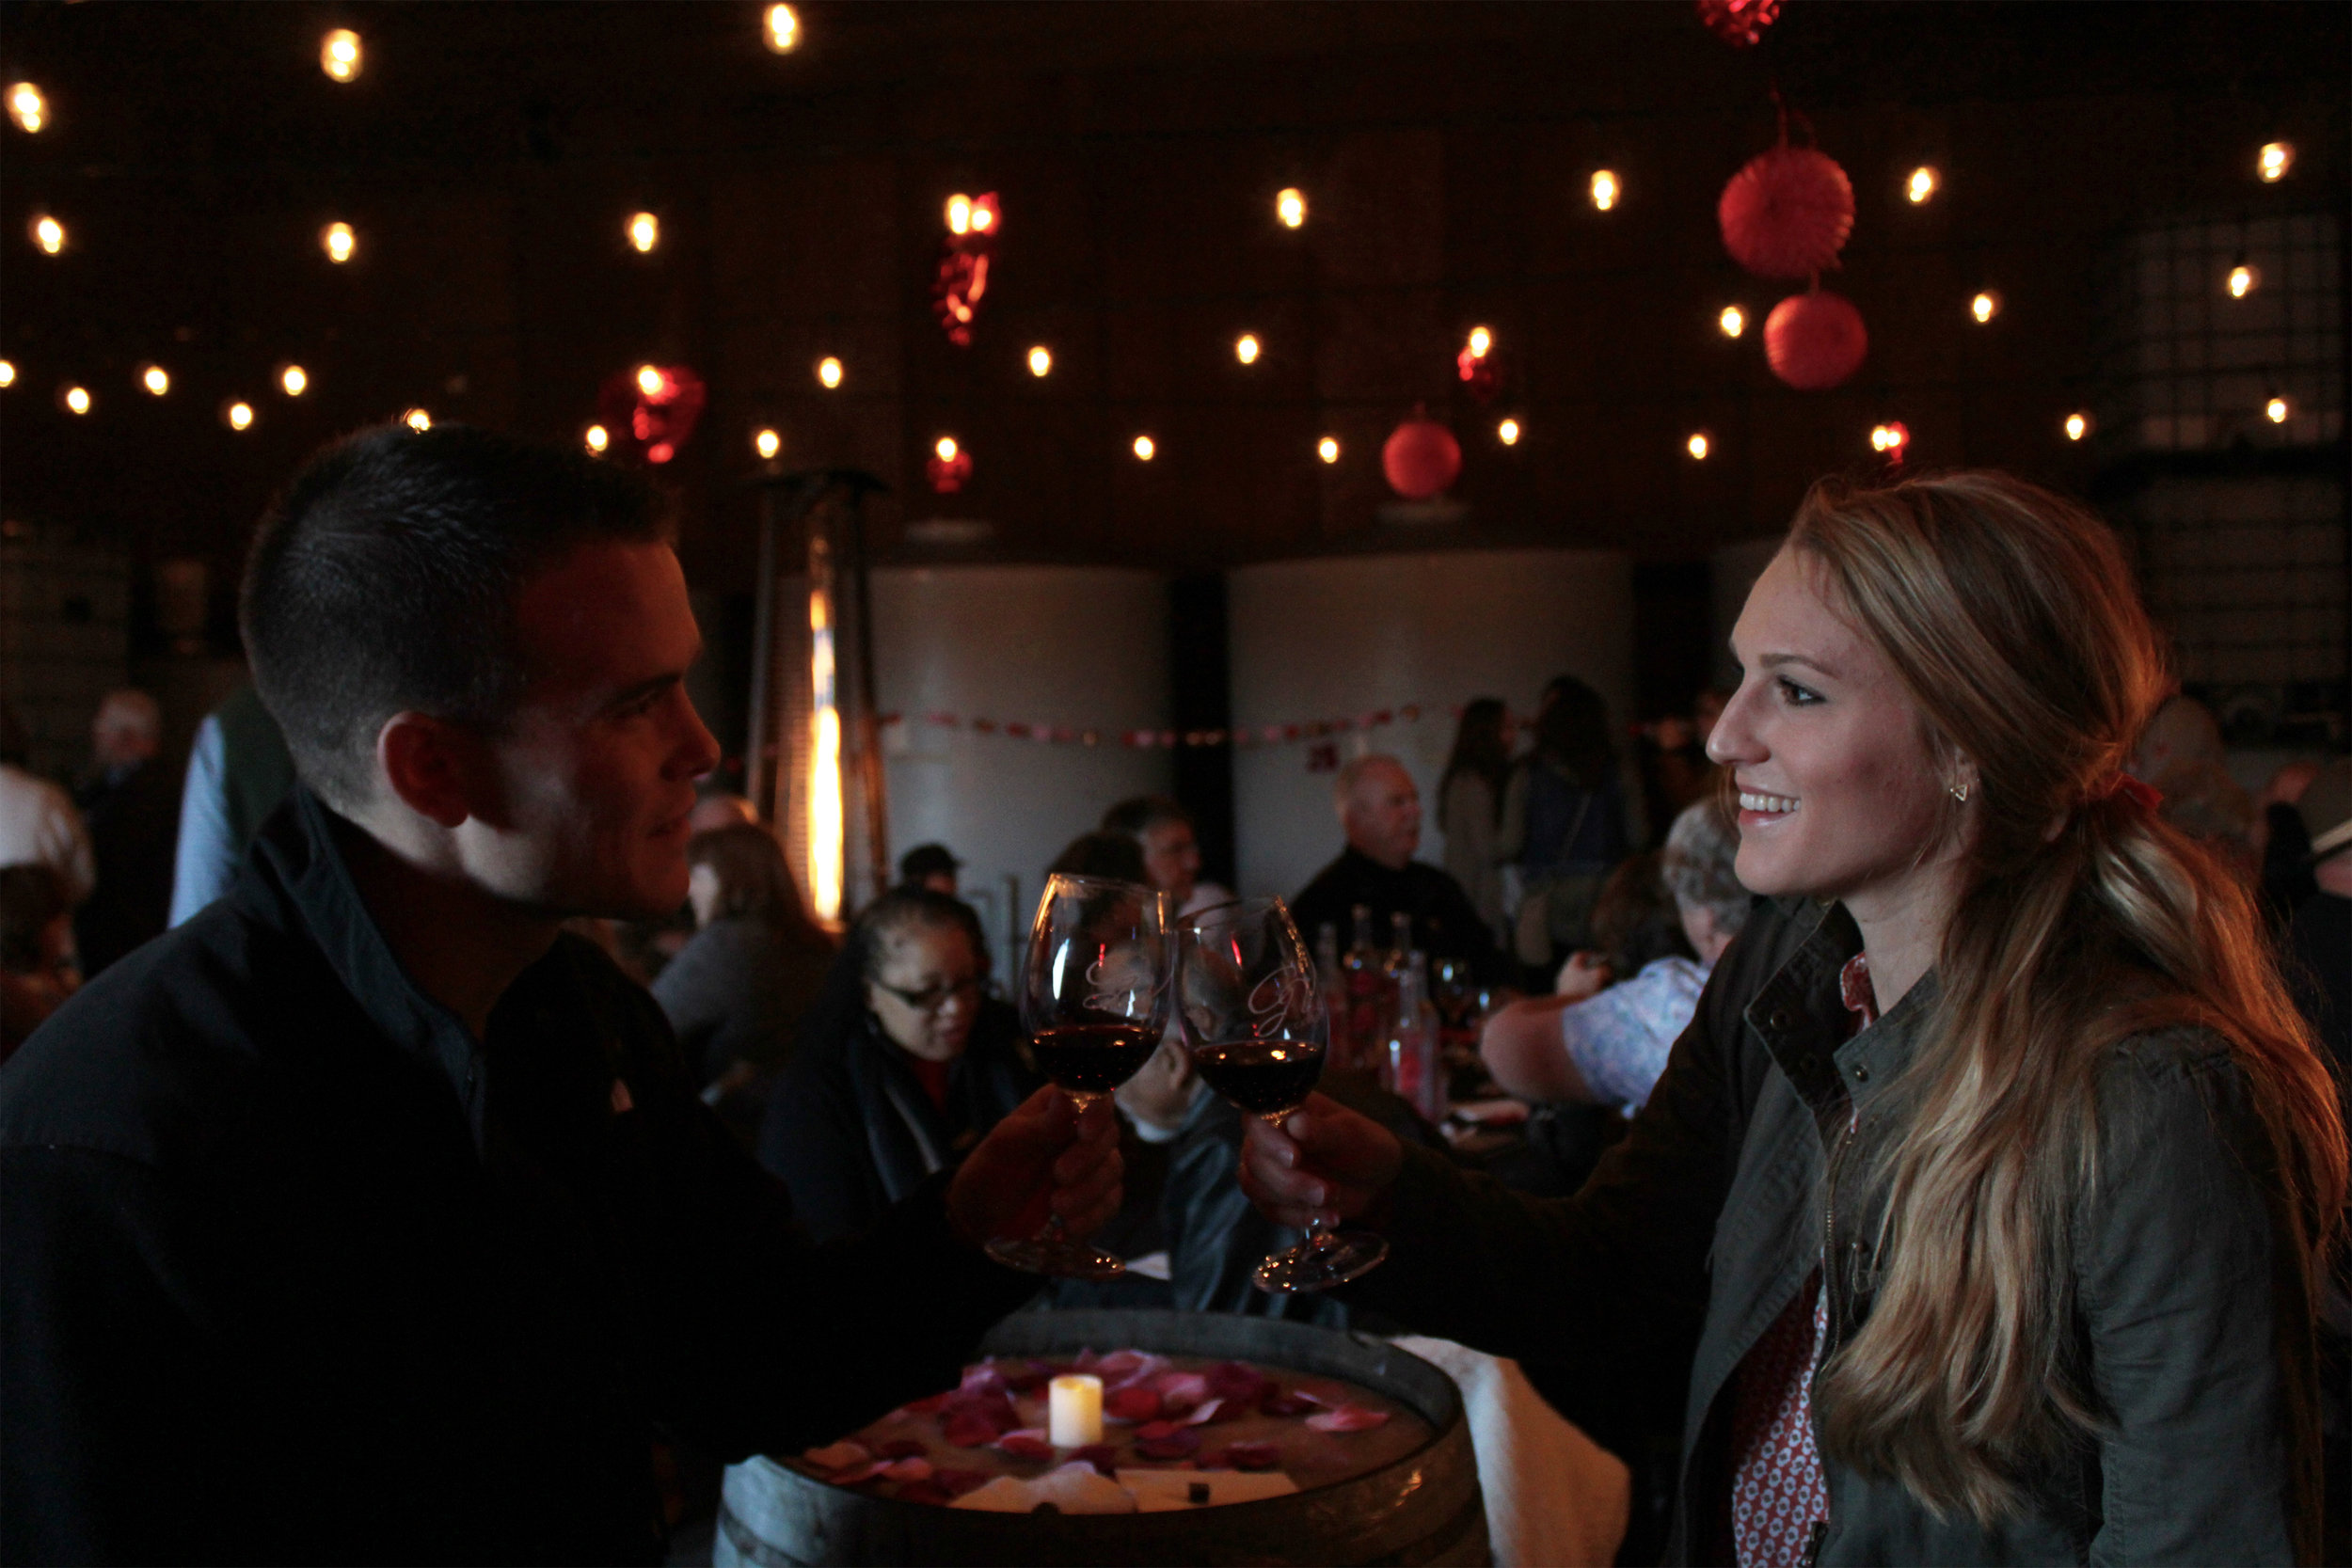 Wine & Chocolate Tasting includes: Wine paired with chocolate:2015 Lapis Luna Chardonnay, 2014 Dolcetto, 2014 Syrah, White Label 2013 Cabernet Sauvignon. Barrel tasting:2015 Dolcetto, 2015 Syrah. Complimentary tasting:Platinum 2014 Old Vine Zinfandel